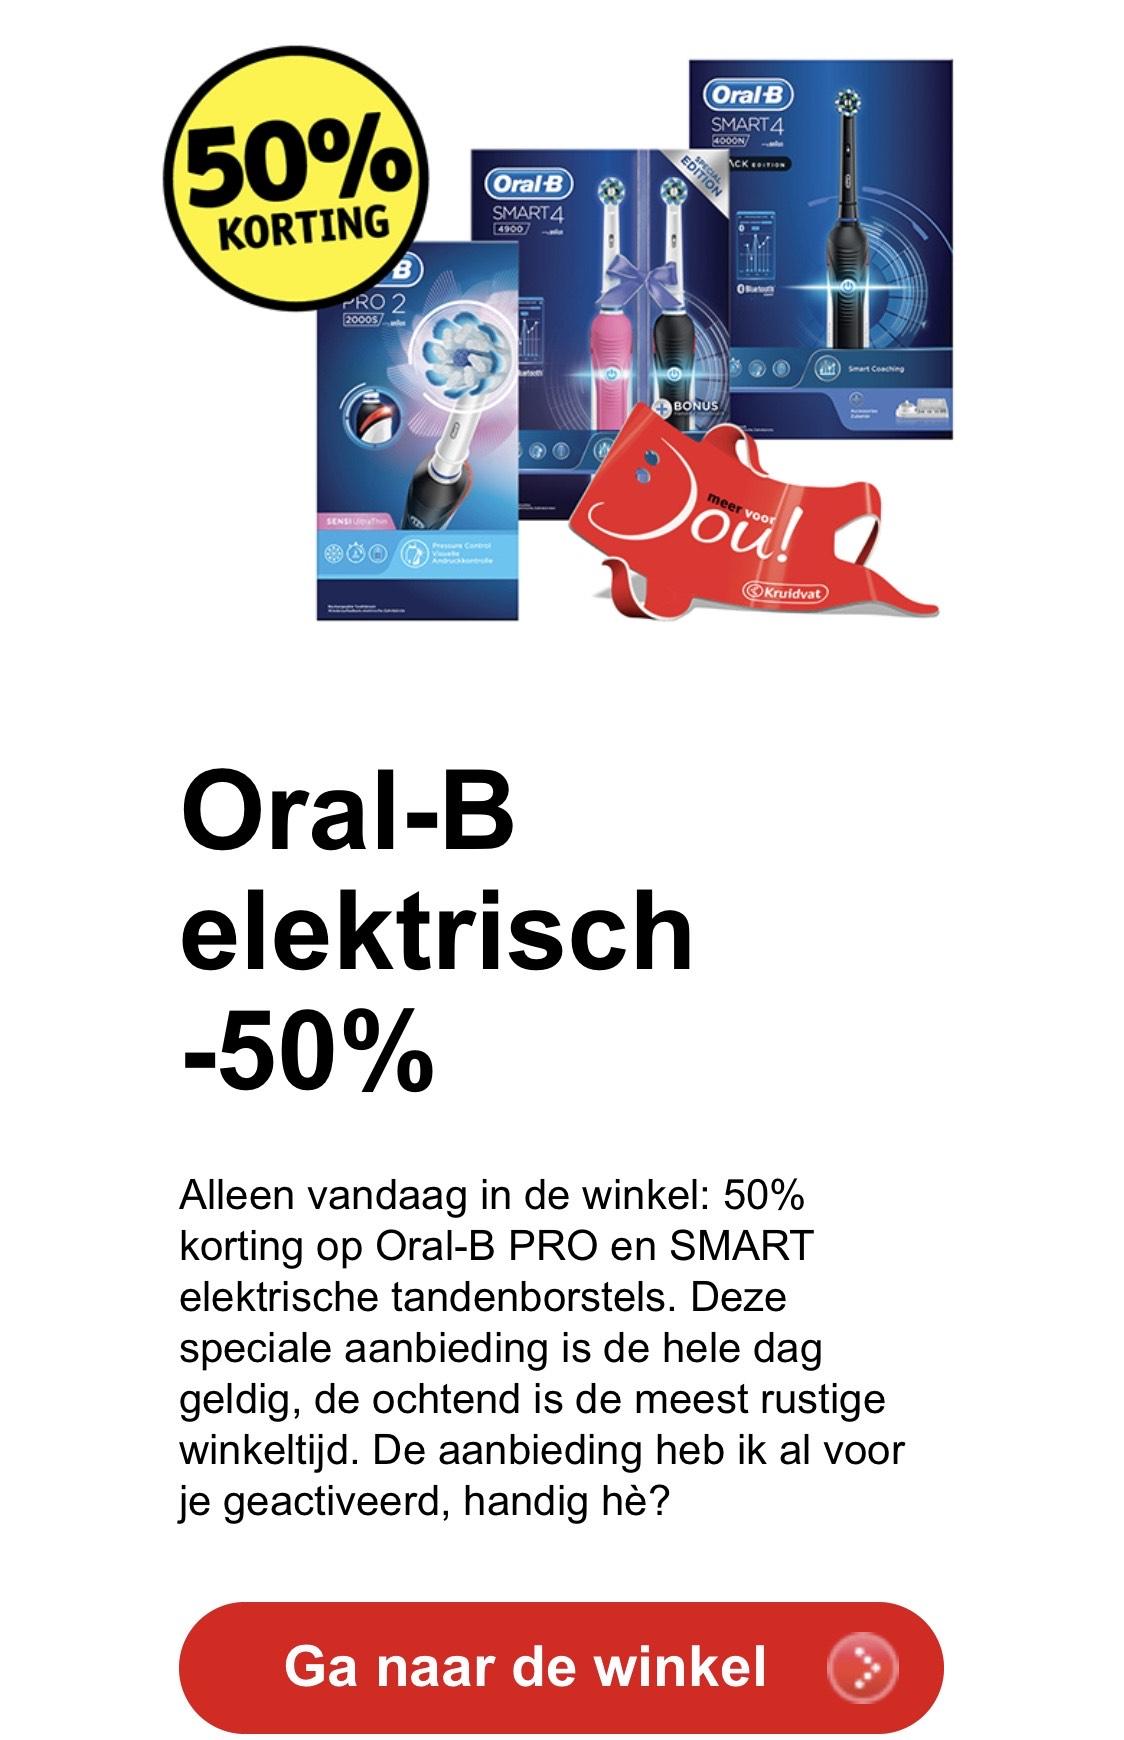 67% korting op Oral-B + GRATIS google mini t.w.v. €59 | keuze uit elektrische tandenborstels SMART en PRO